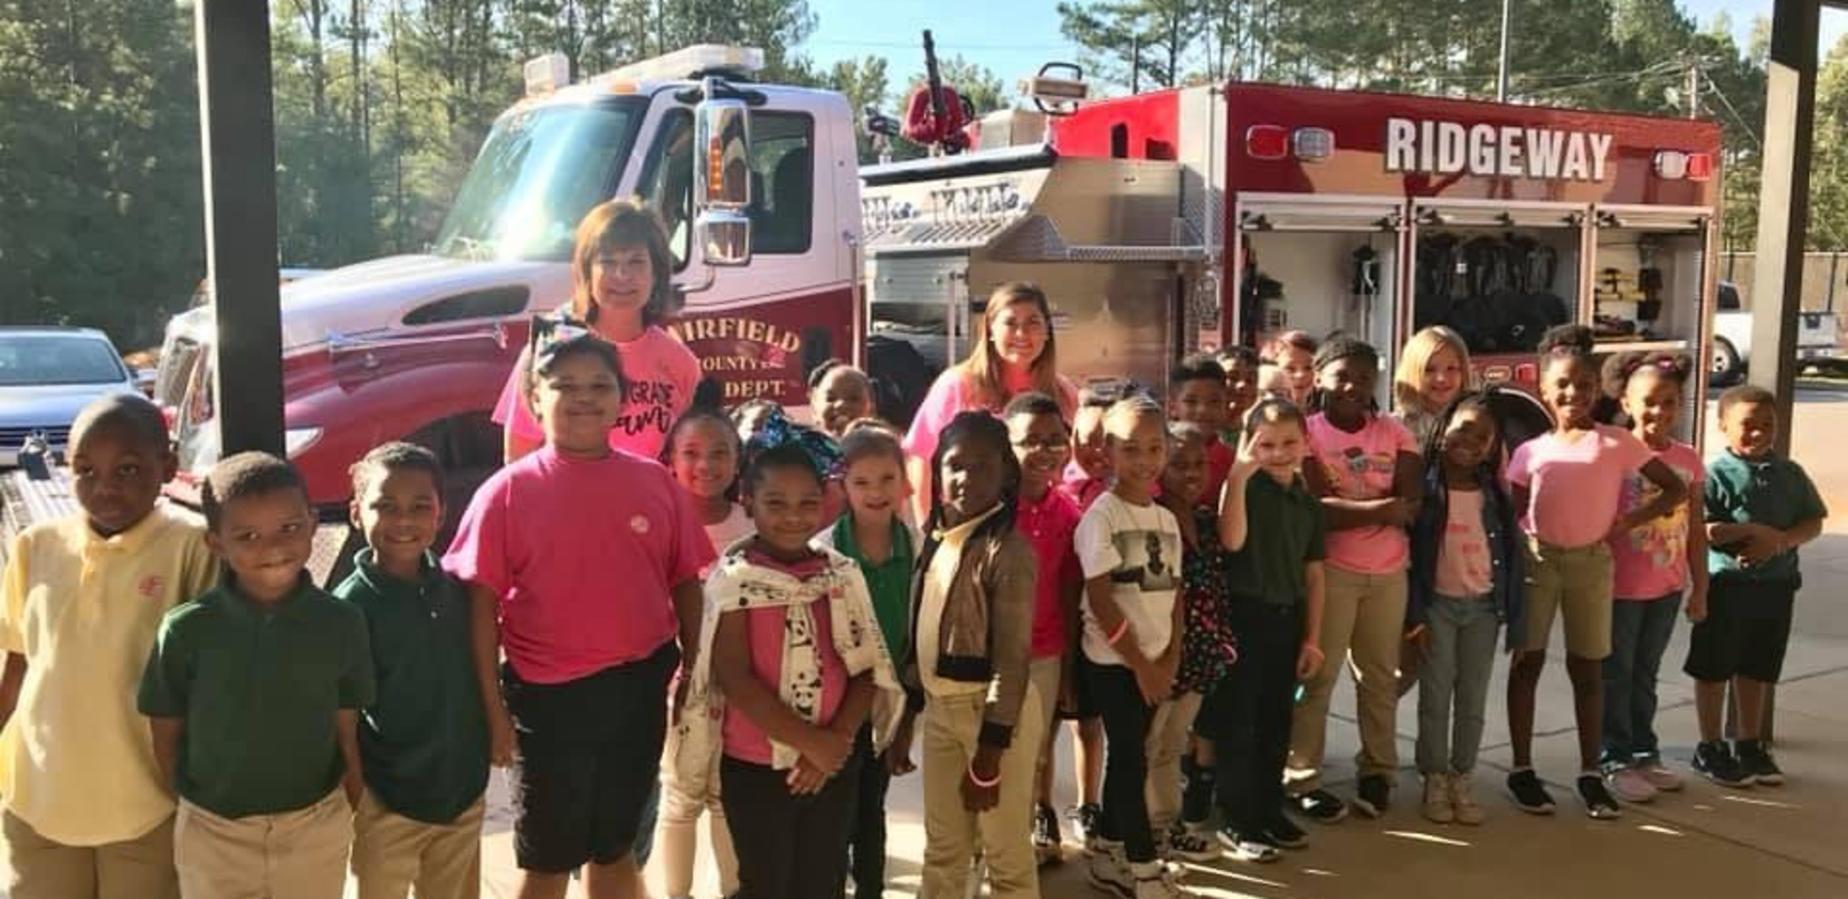 Ridgeway Fire Department visit